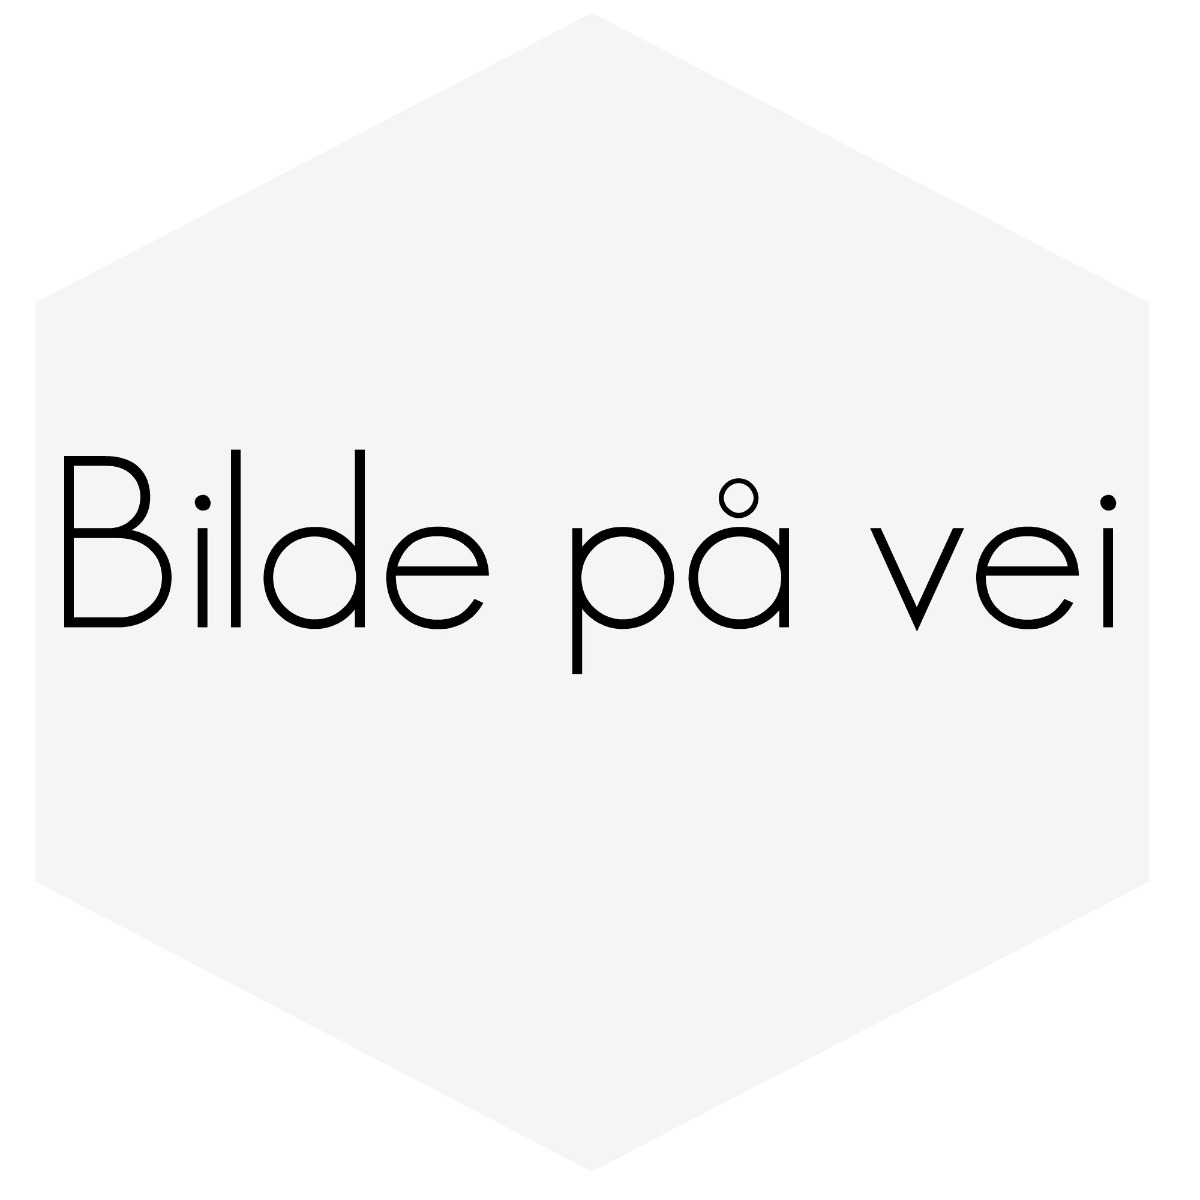 "SILIKONSLANGE RØD REDUSERING 2,5-2,75"" (63-70MM)"